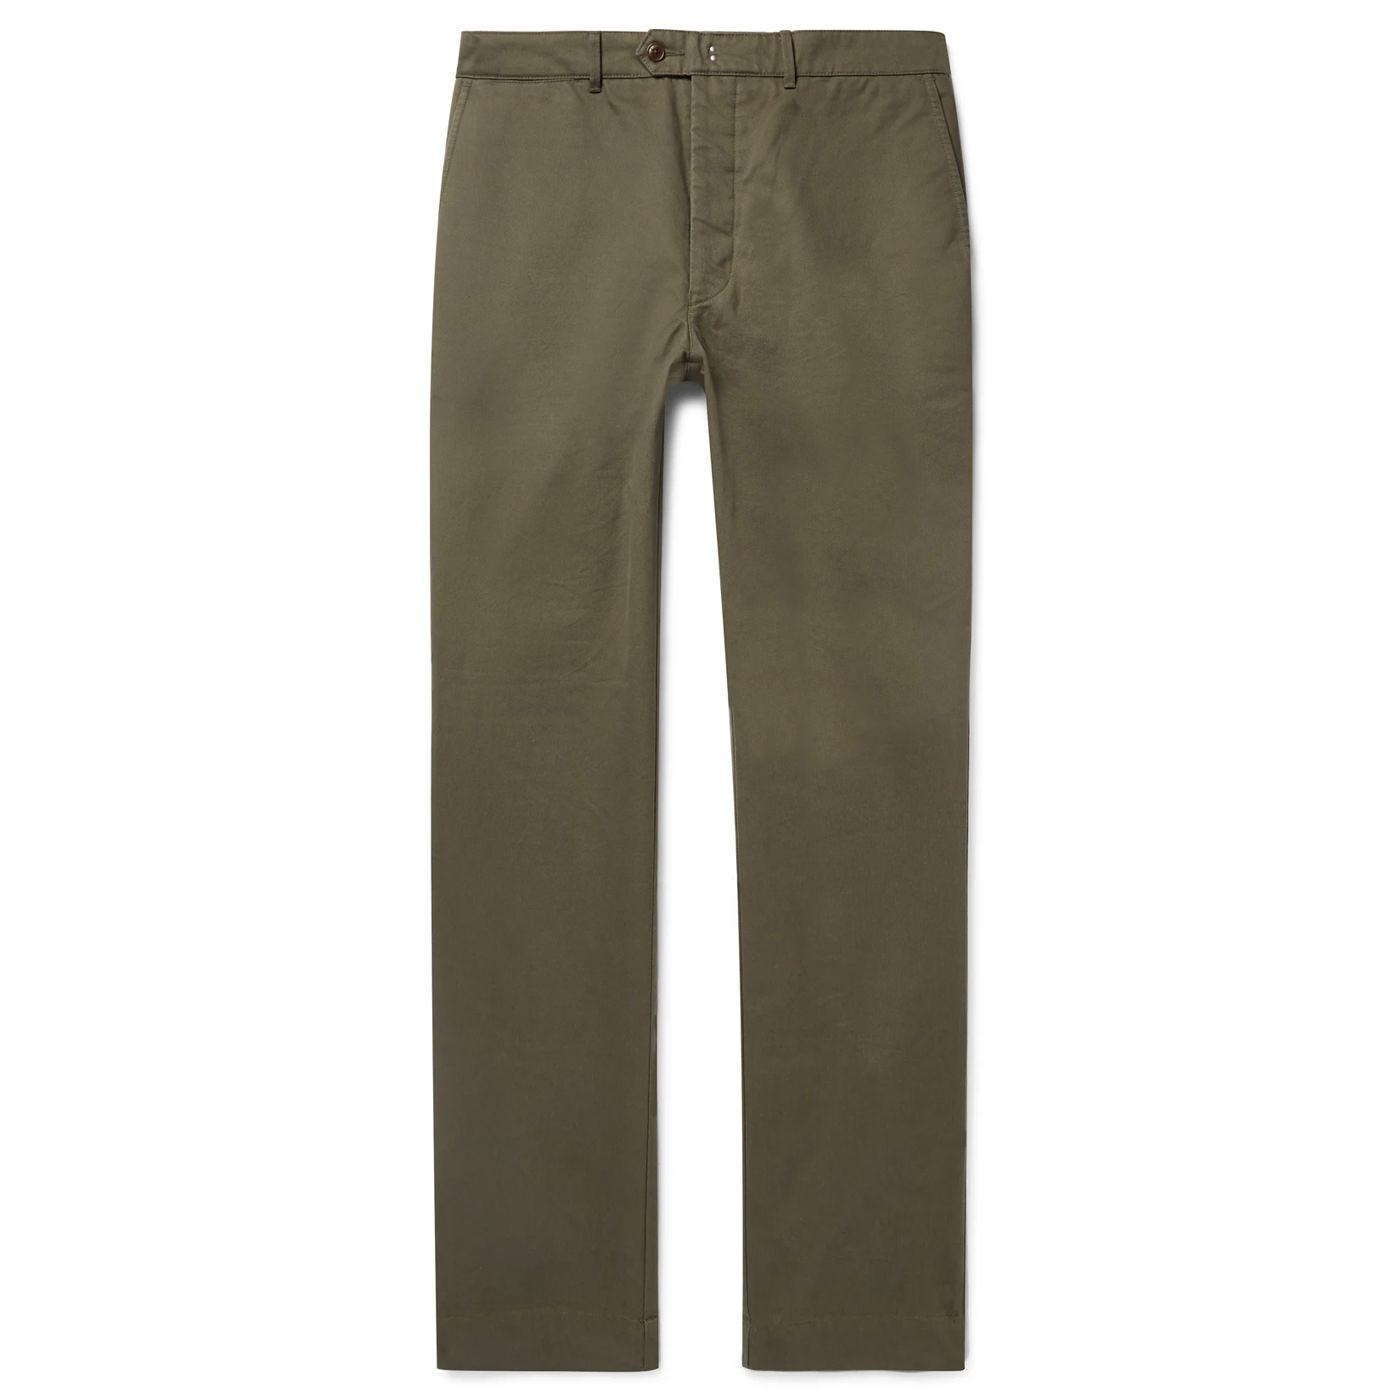 Style Mr Porter Pantalon Chinos Officine Générale vert